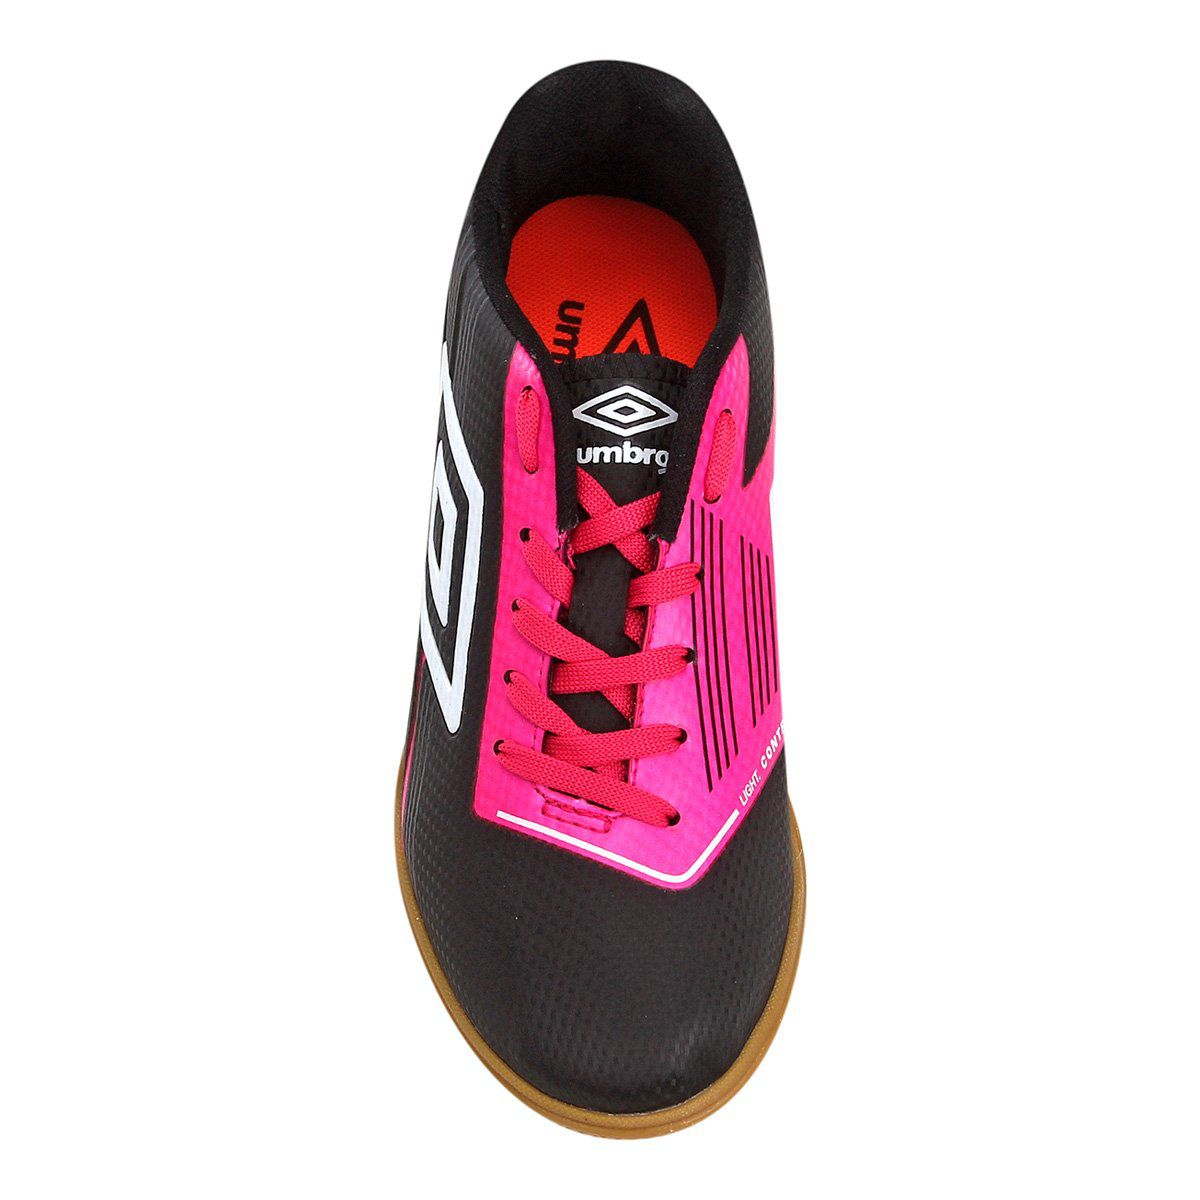 Tênis futsal Umbro Light Control - Feminino - Preto e Rosa